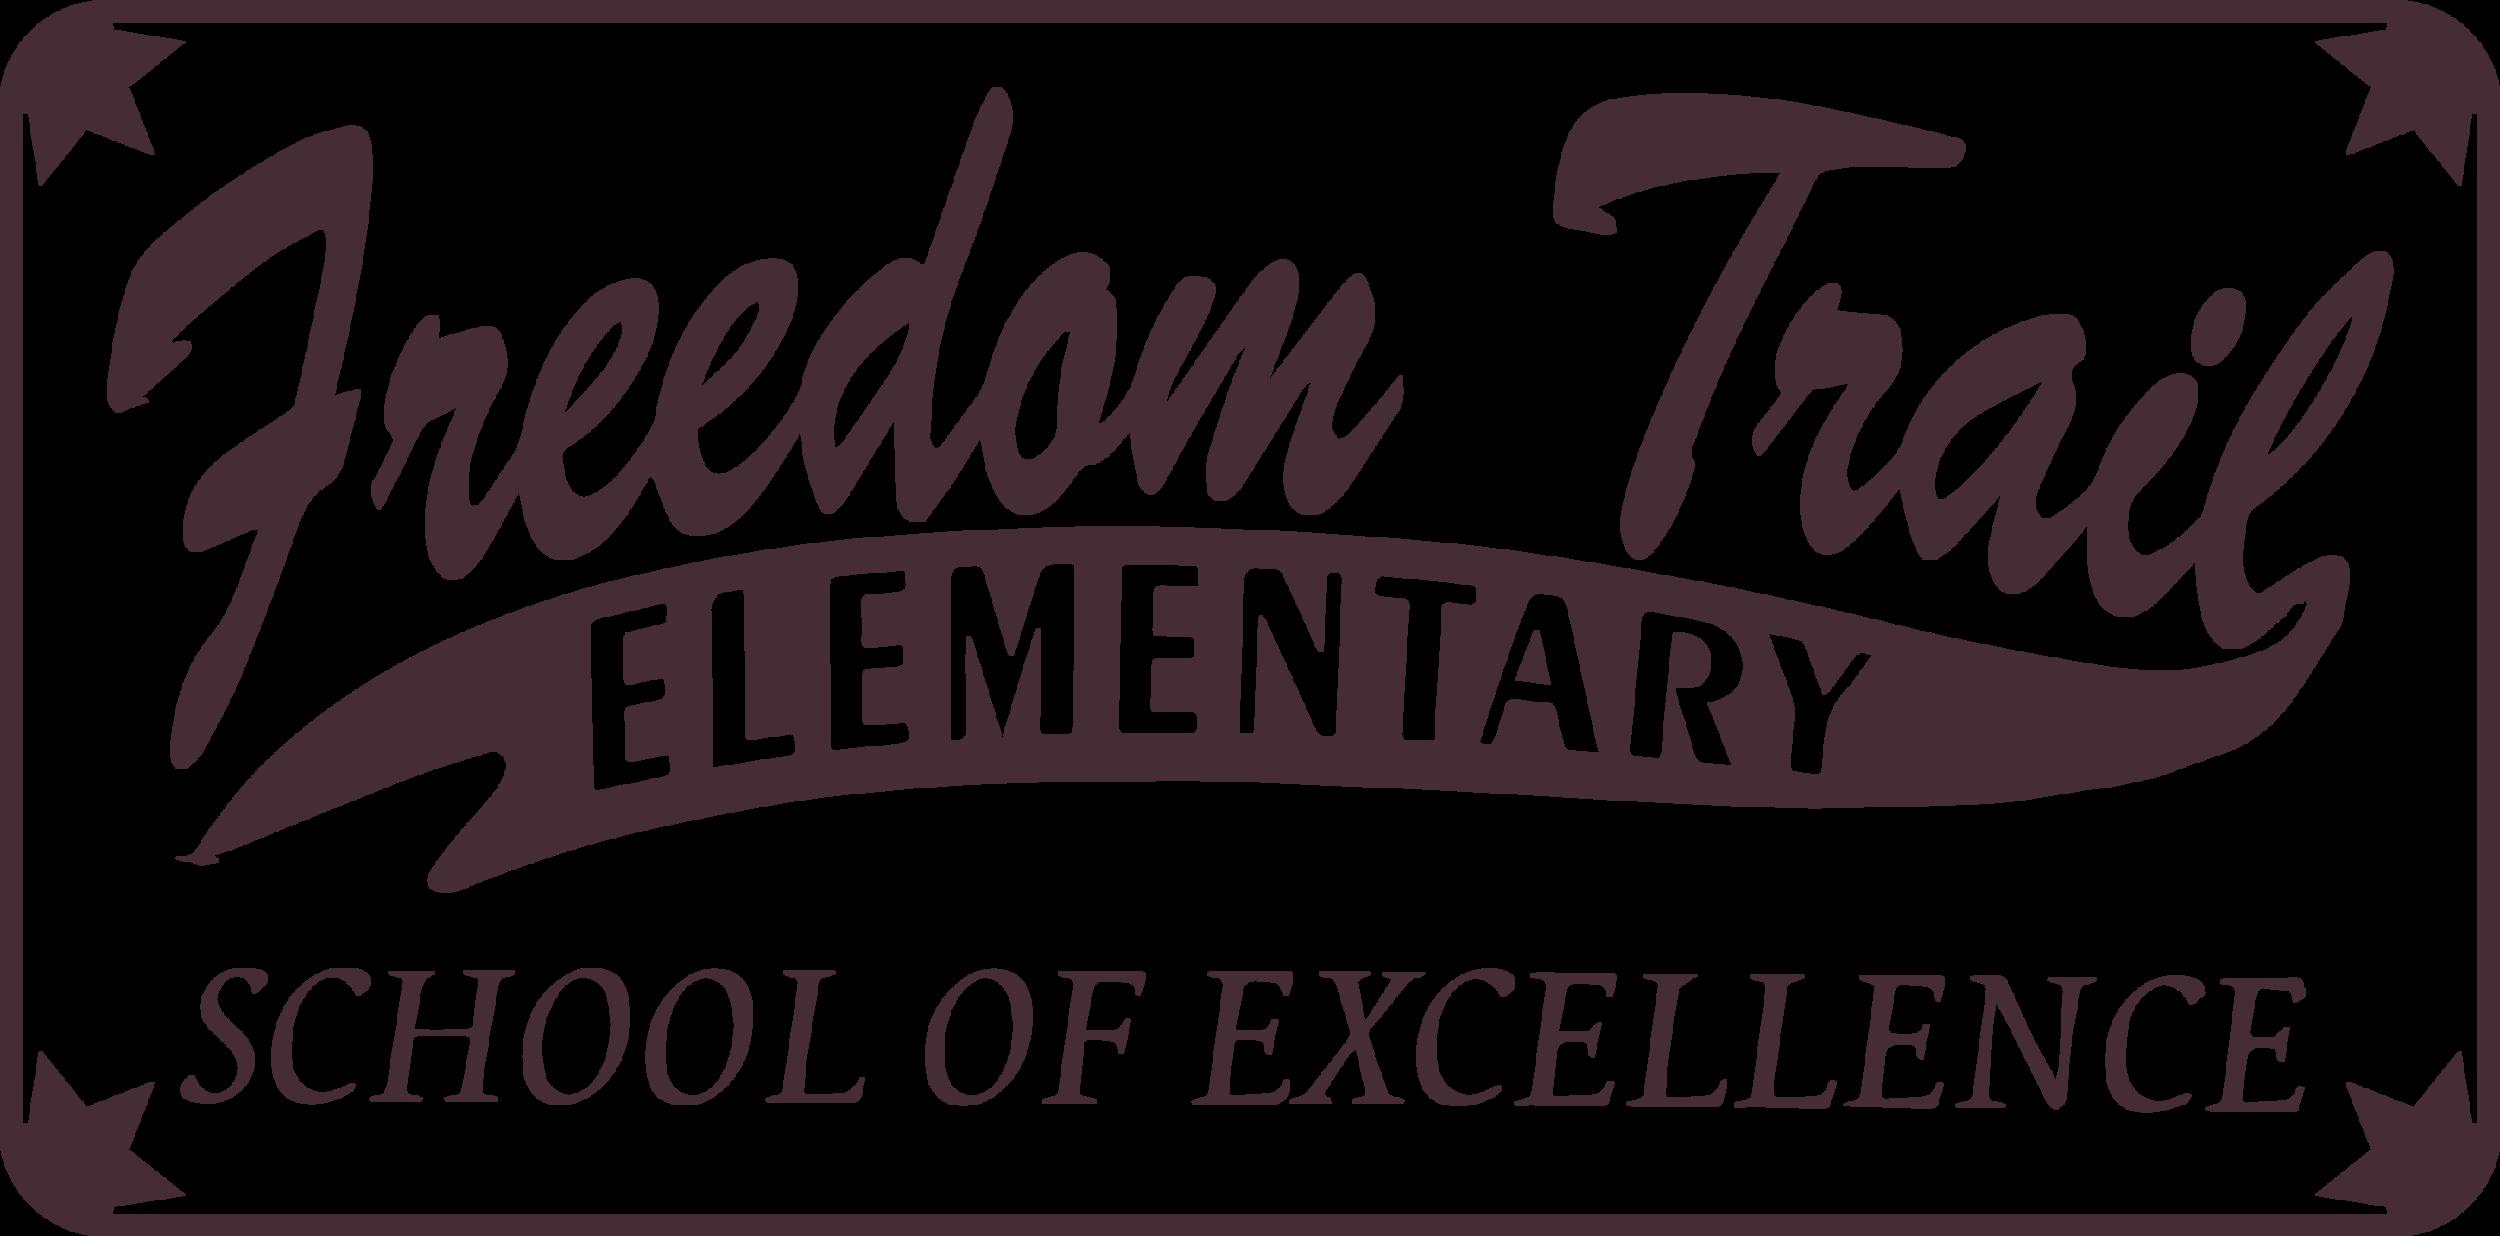 freedom-trail-logo.png